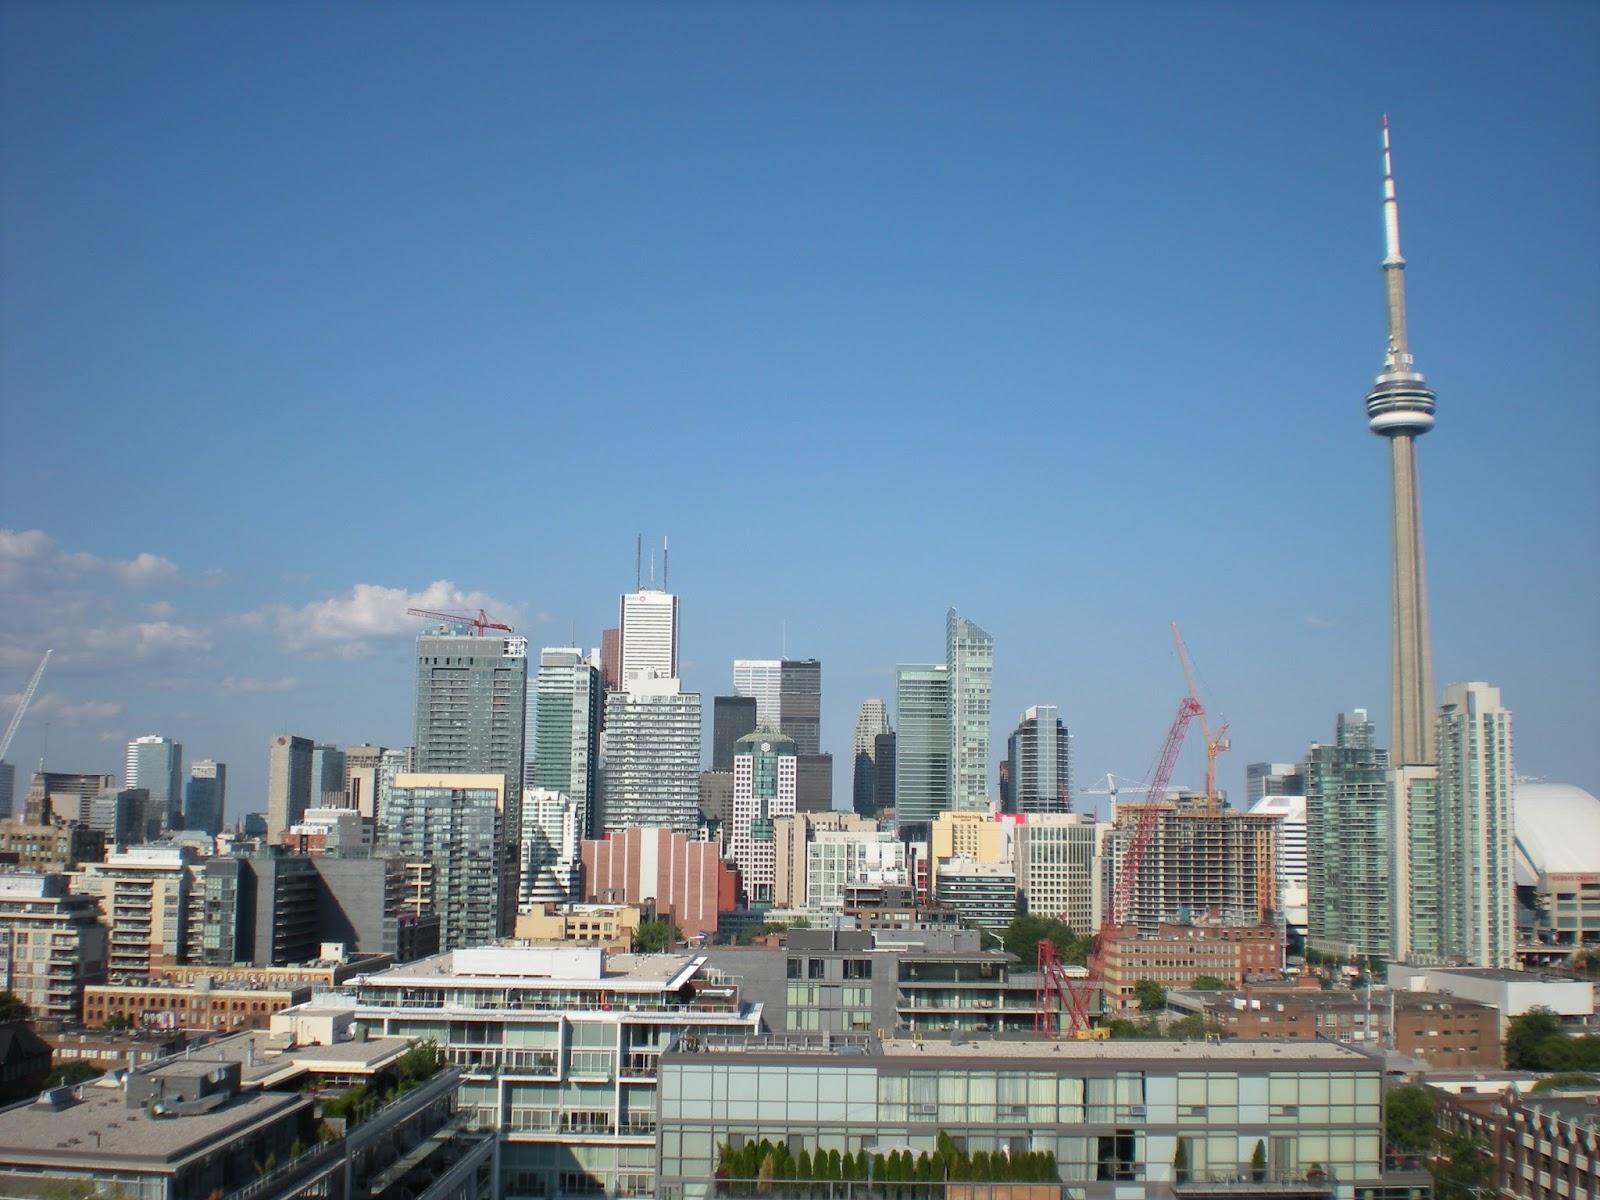 Art & Culture Maven: A Love Letter to Downtown Toronto #Toronto